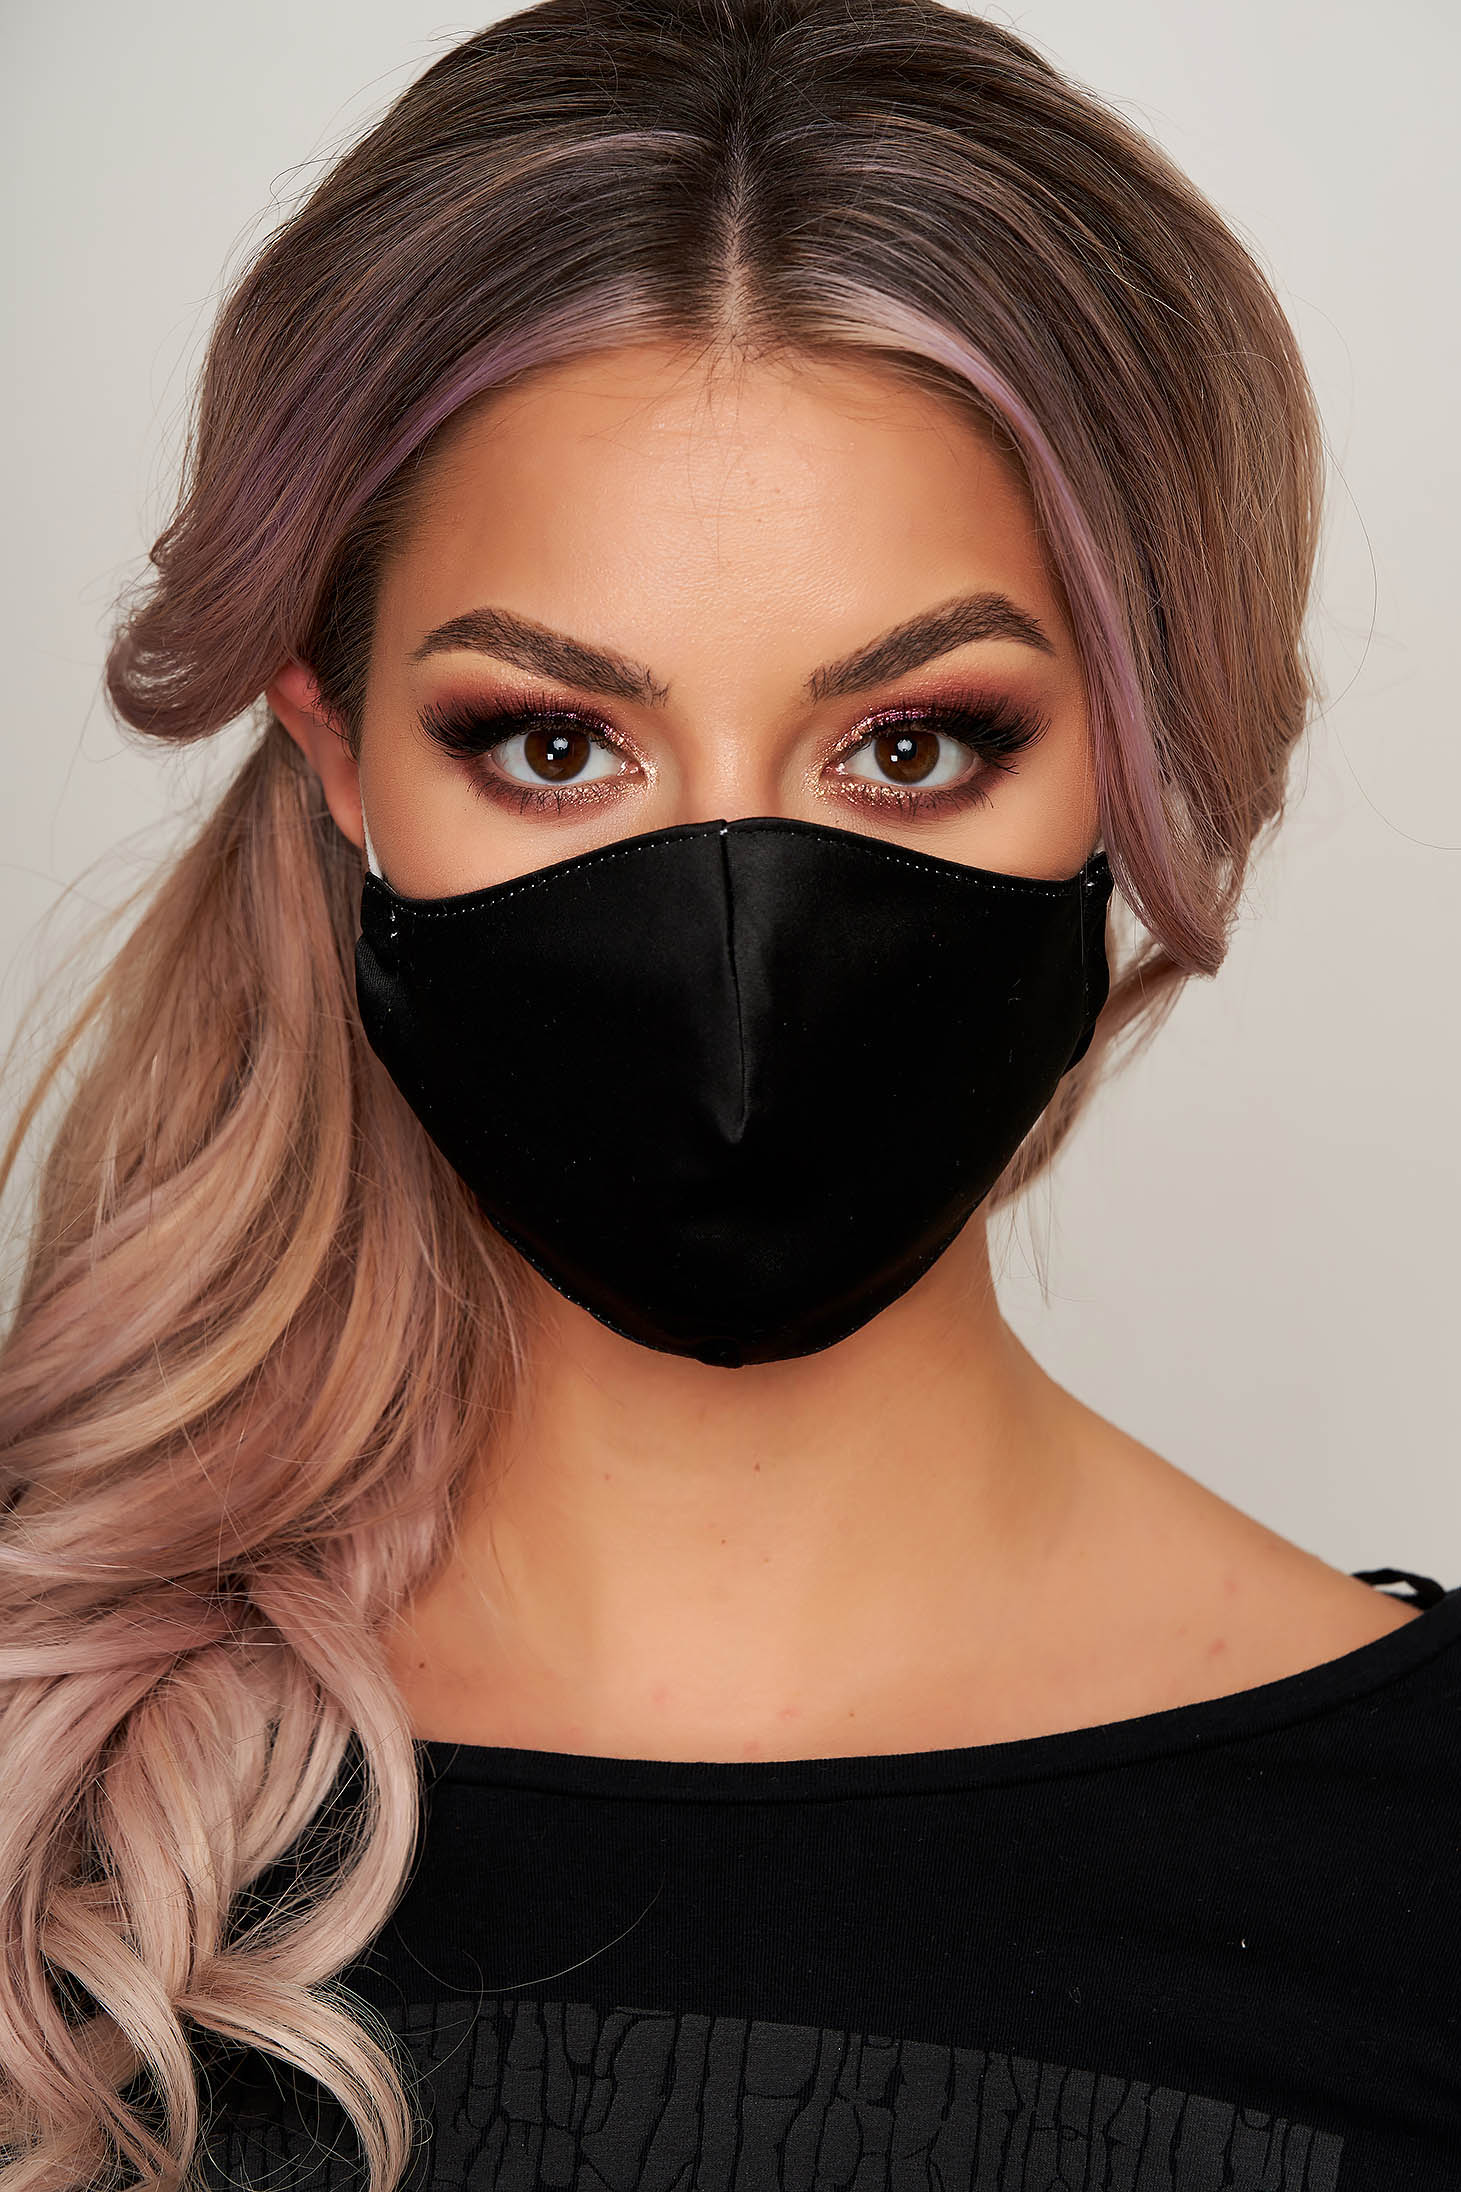 Masca textila pentru femei StarShinerS neagra